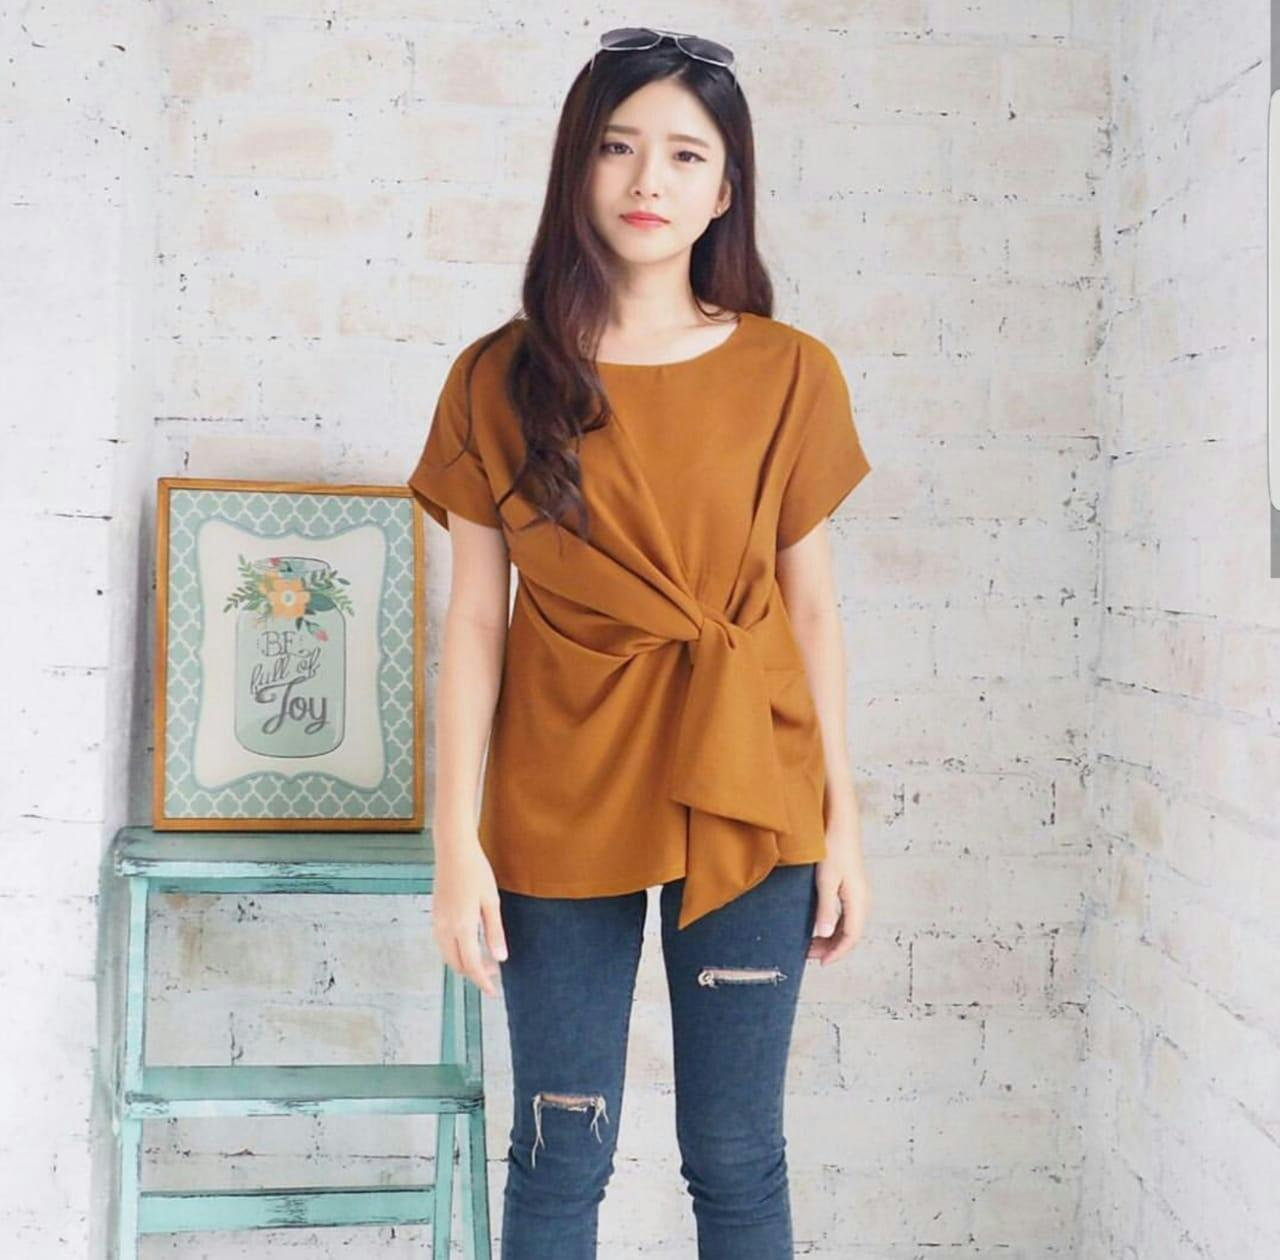 inbox fashion blouse elivia hello / baju import / Baju Wanita / Blouse Korea / Atasan